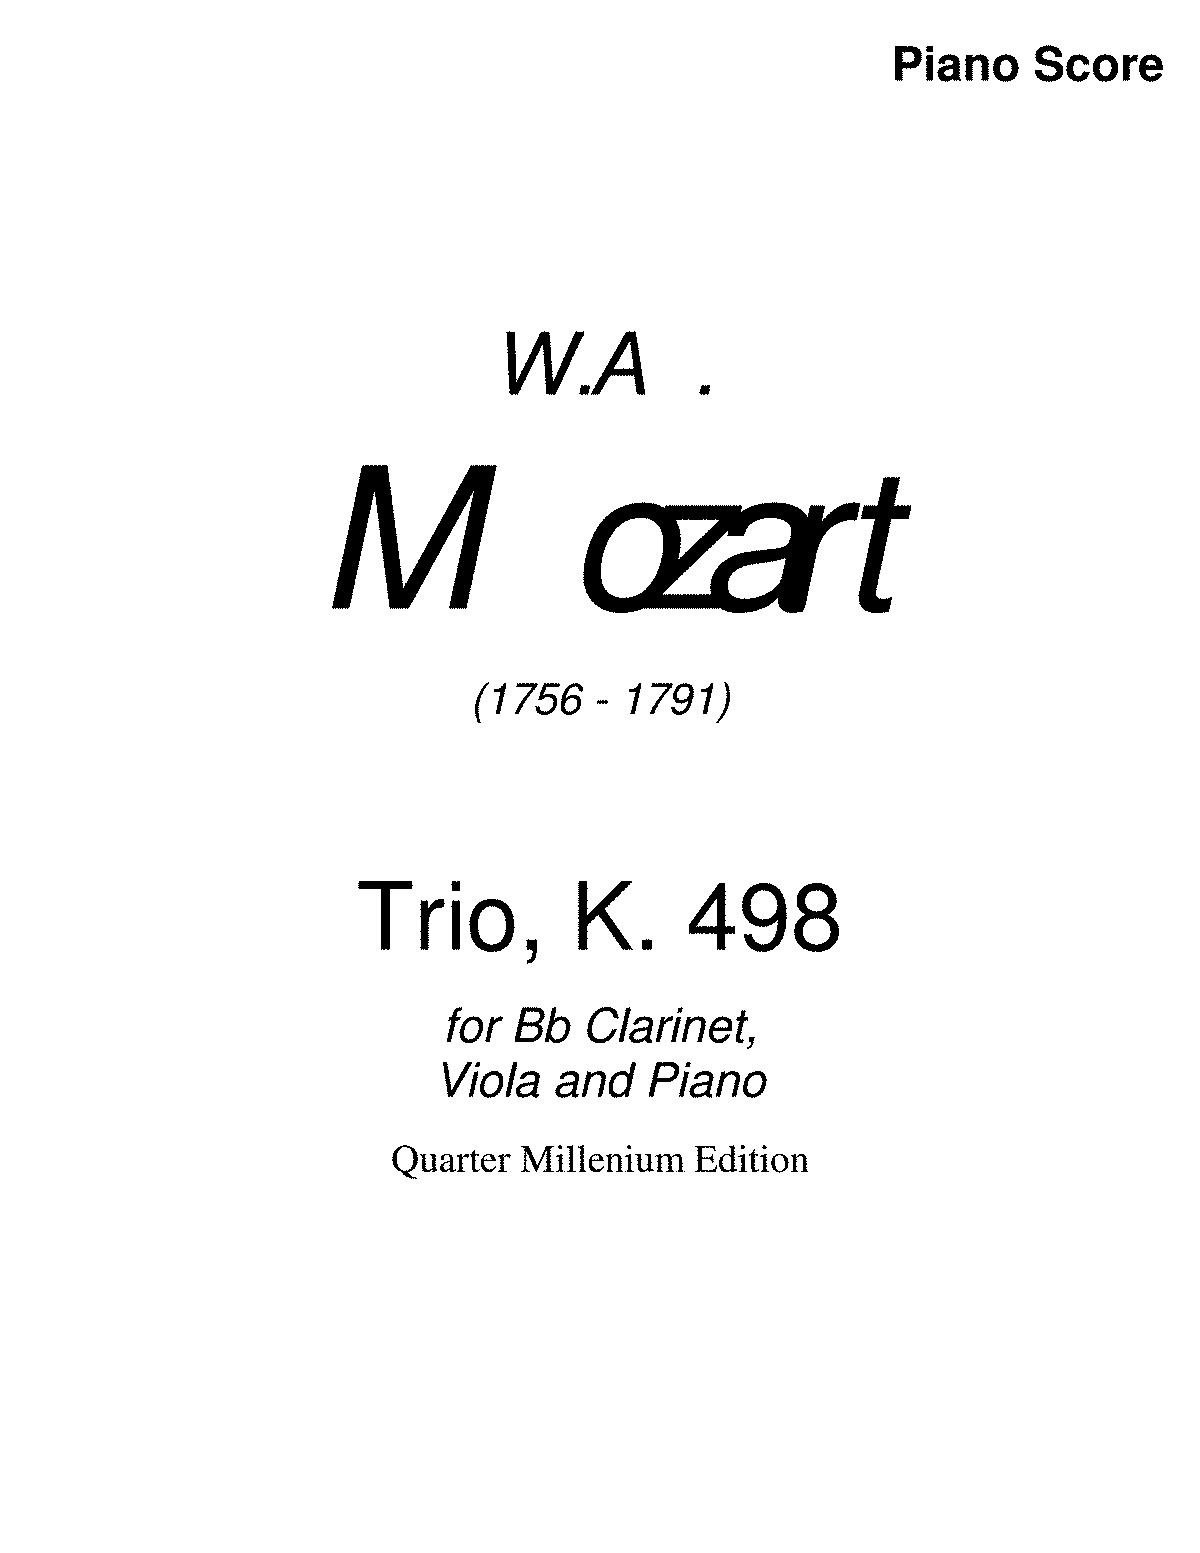 Trio in E-flat major, K.498 (Mozart, Wolfgang Amadeus